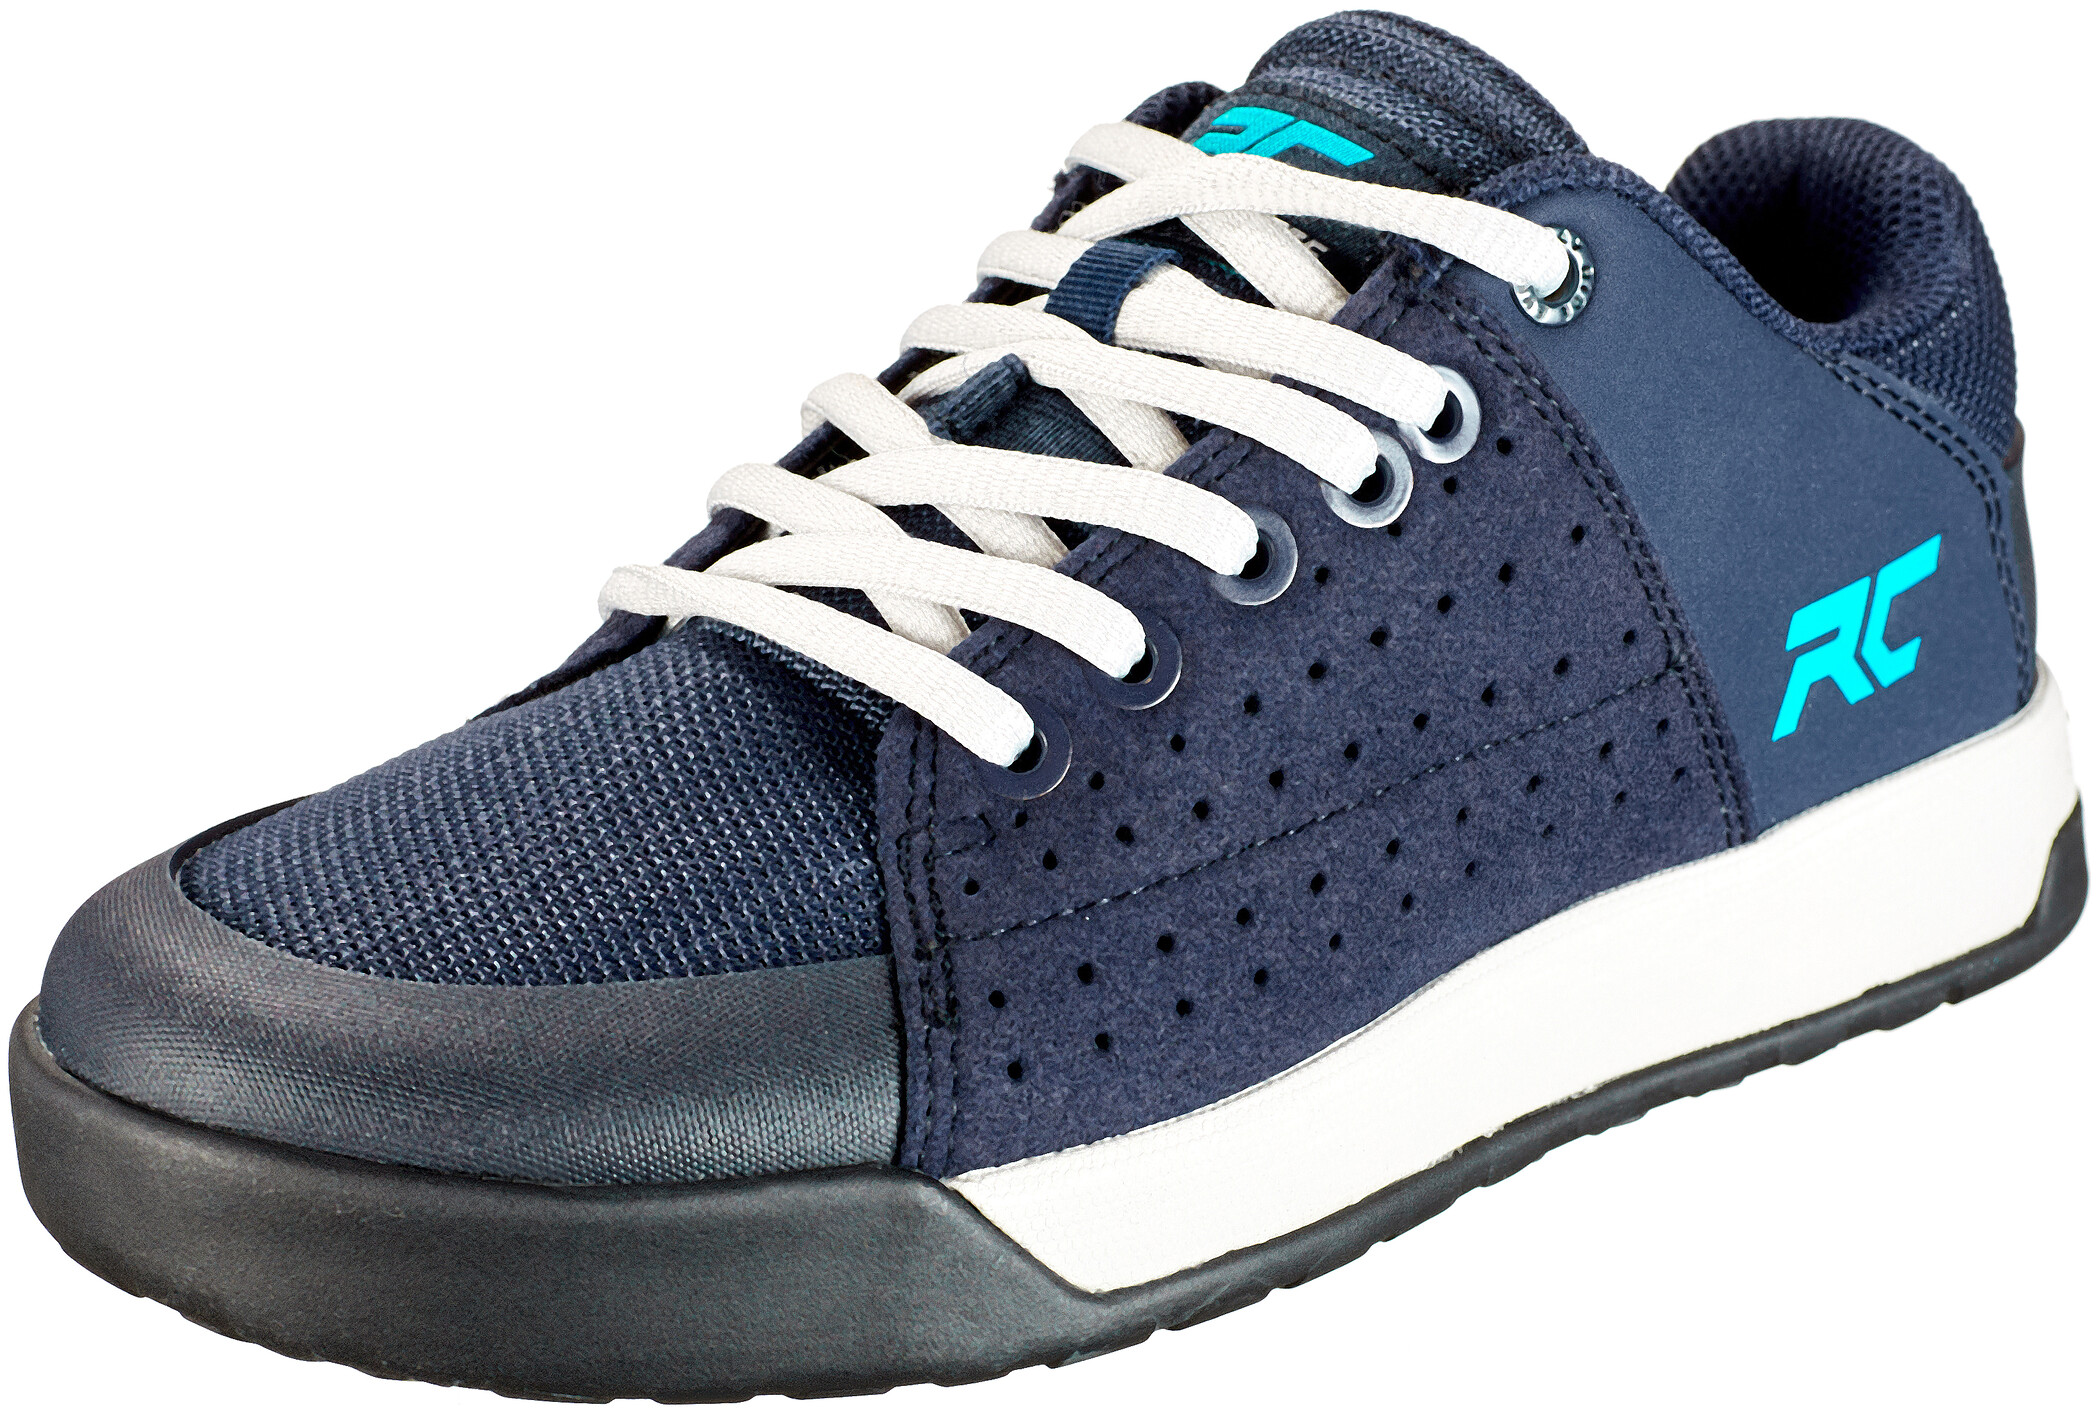 Mens Lightweight Road Running Shoes Hawaii Skull Flower No Tie Mesh Sport Athletic Sneakers